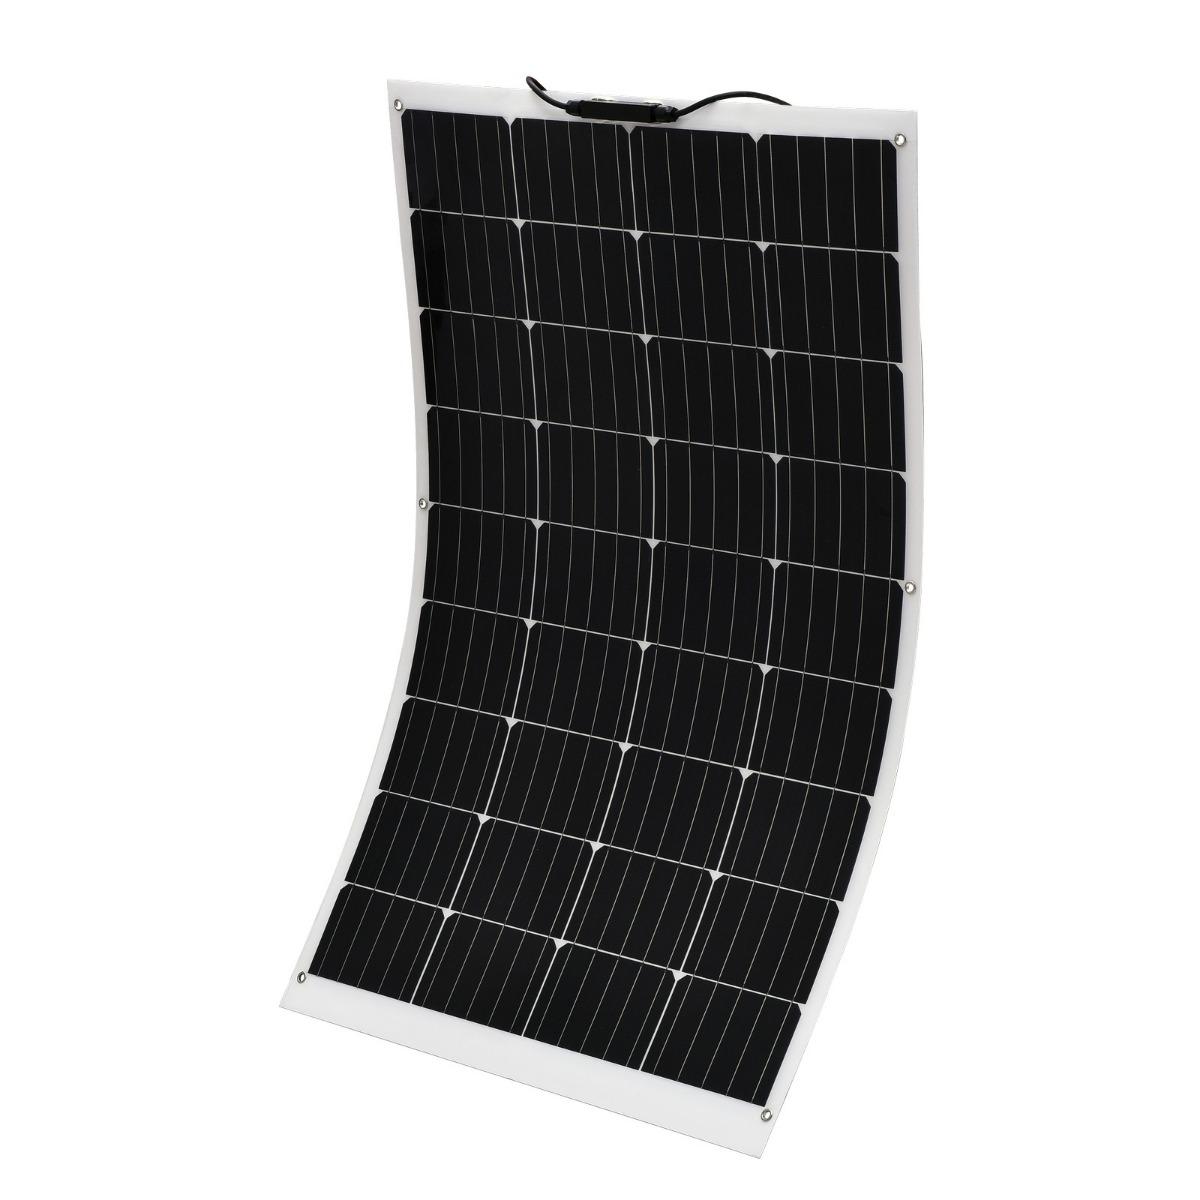 180W 12V Flexible Solar Panel Boat Caravan Camping Power Mono Charging Kit